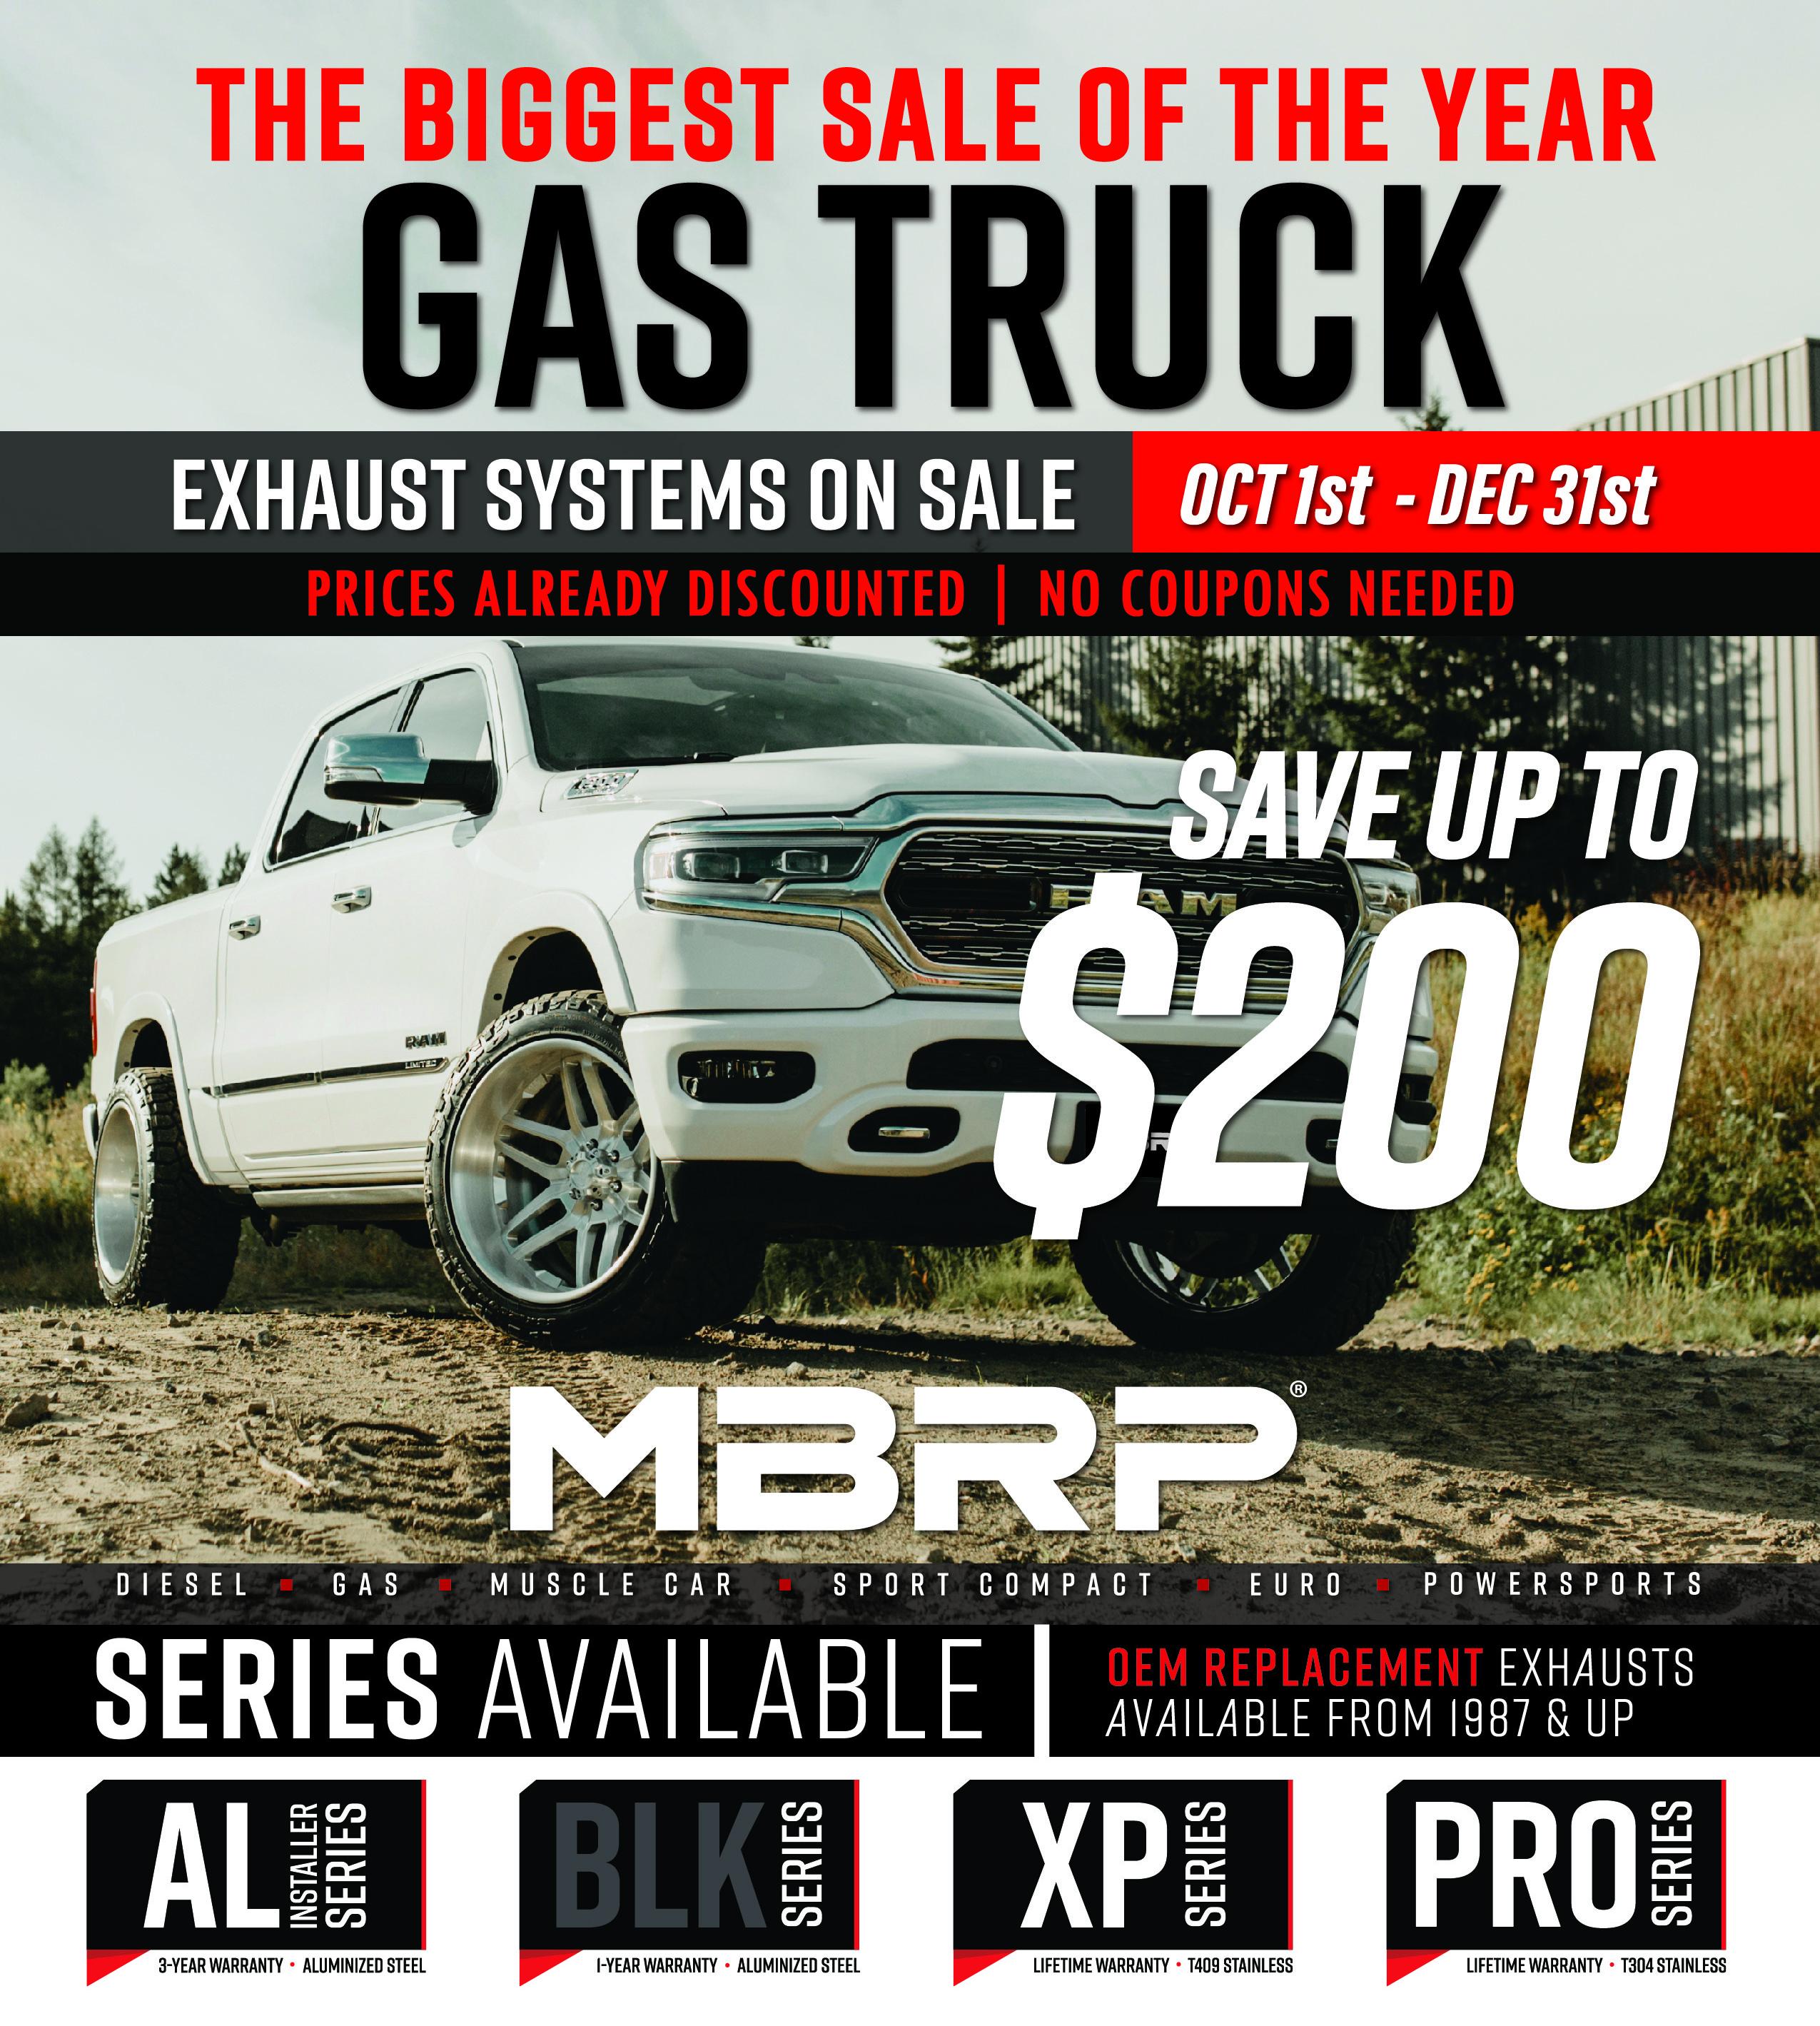 gas-truck-promo-details-update.jpg